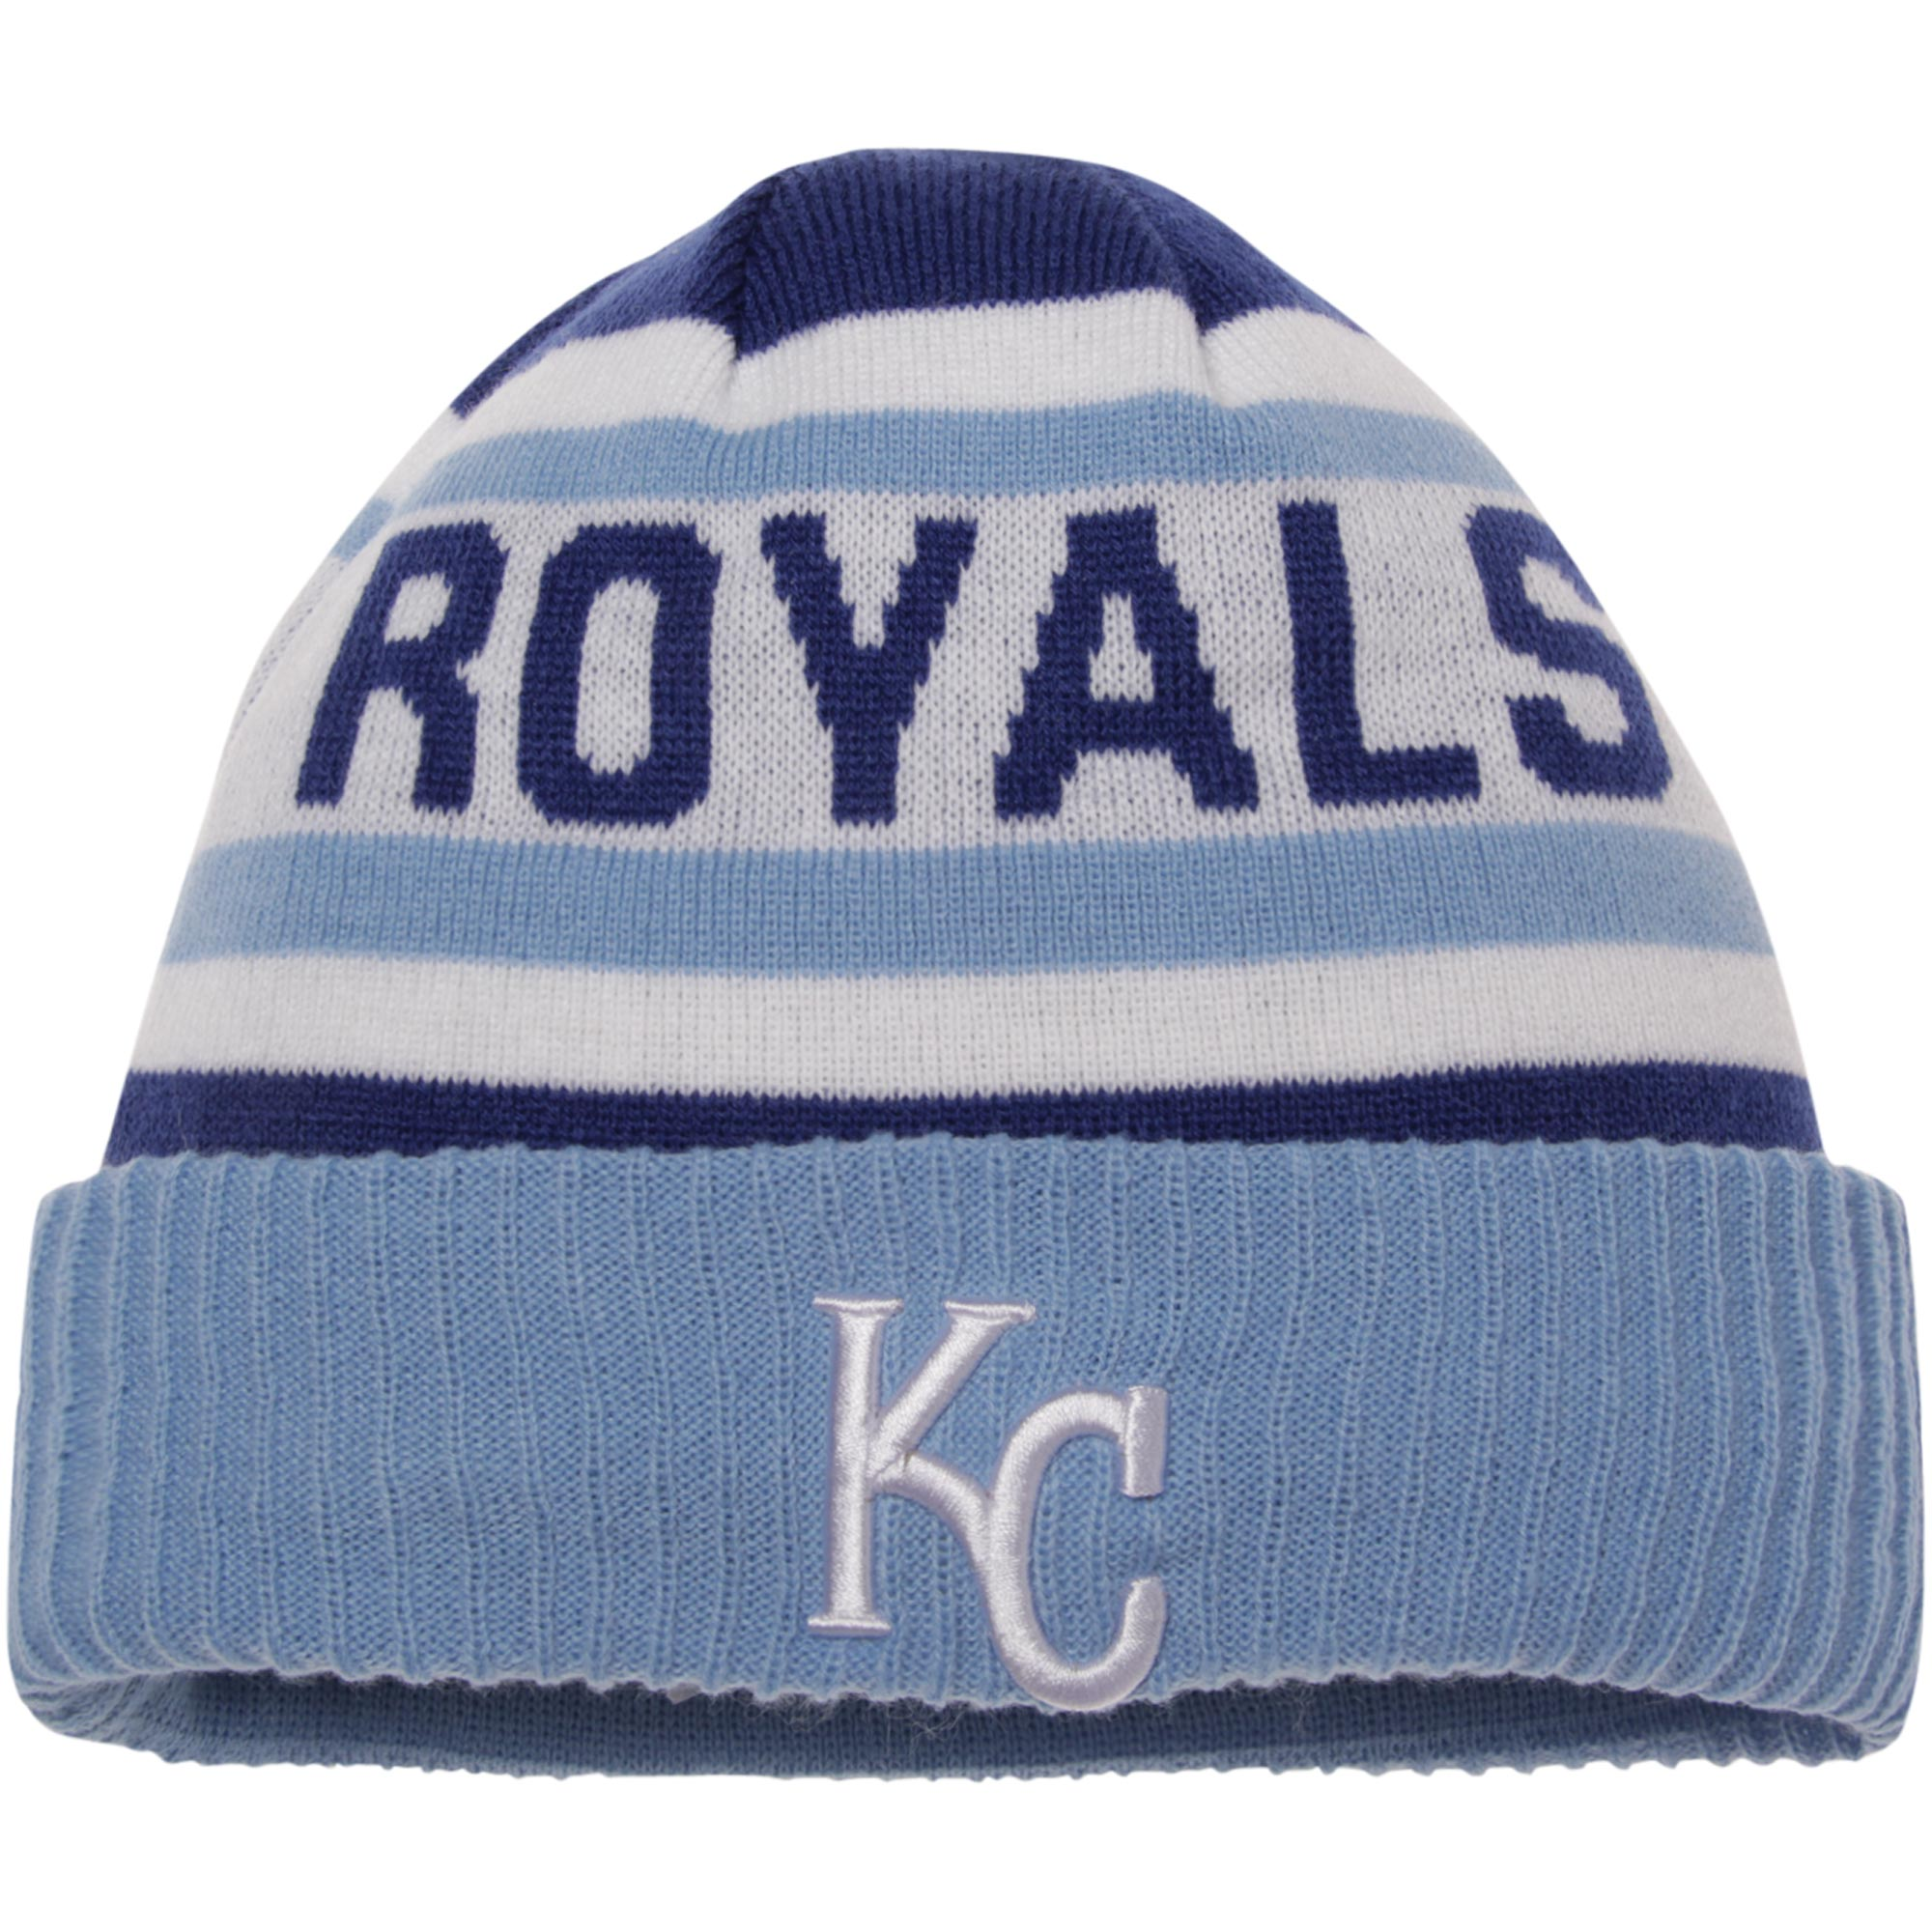 Kansas City Royals New Era Biggest Fan 2.0 Cuffed Knit Hat - White/Light Blue - OSFA